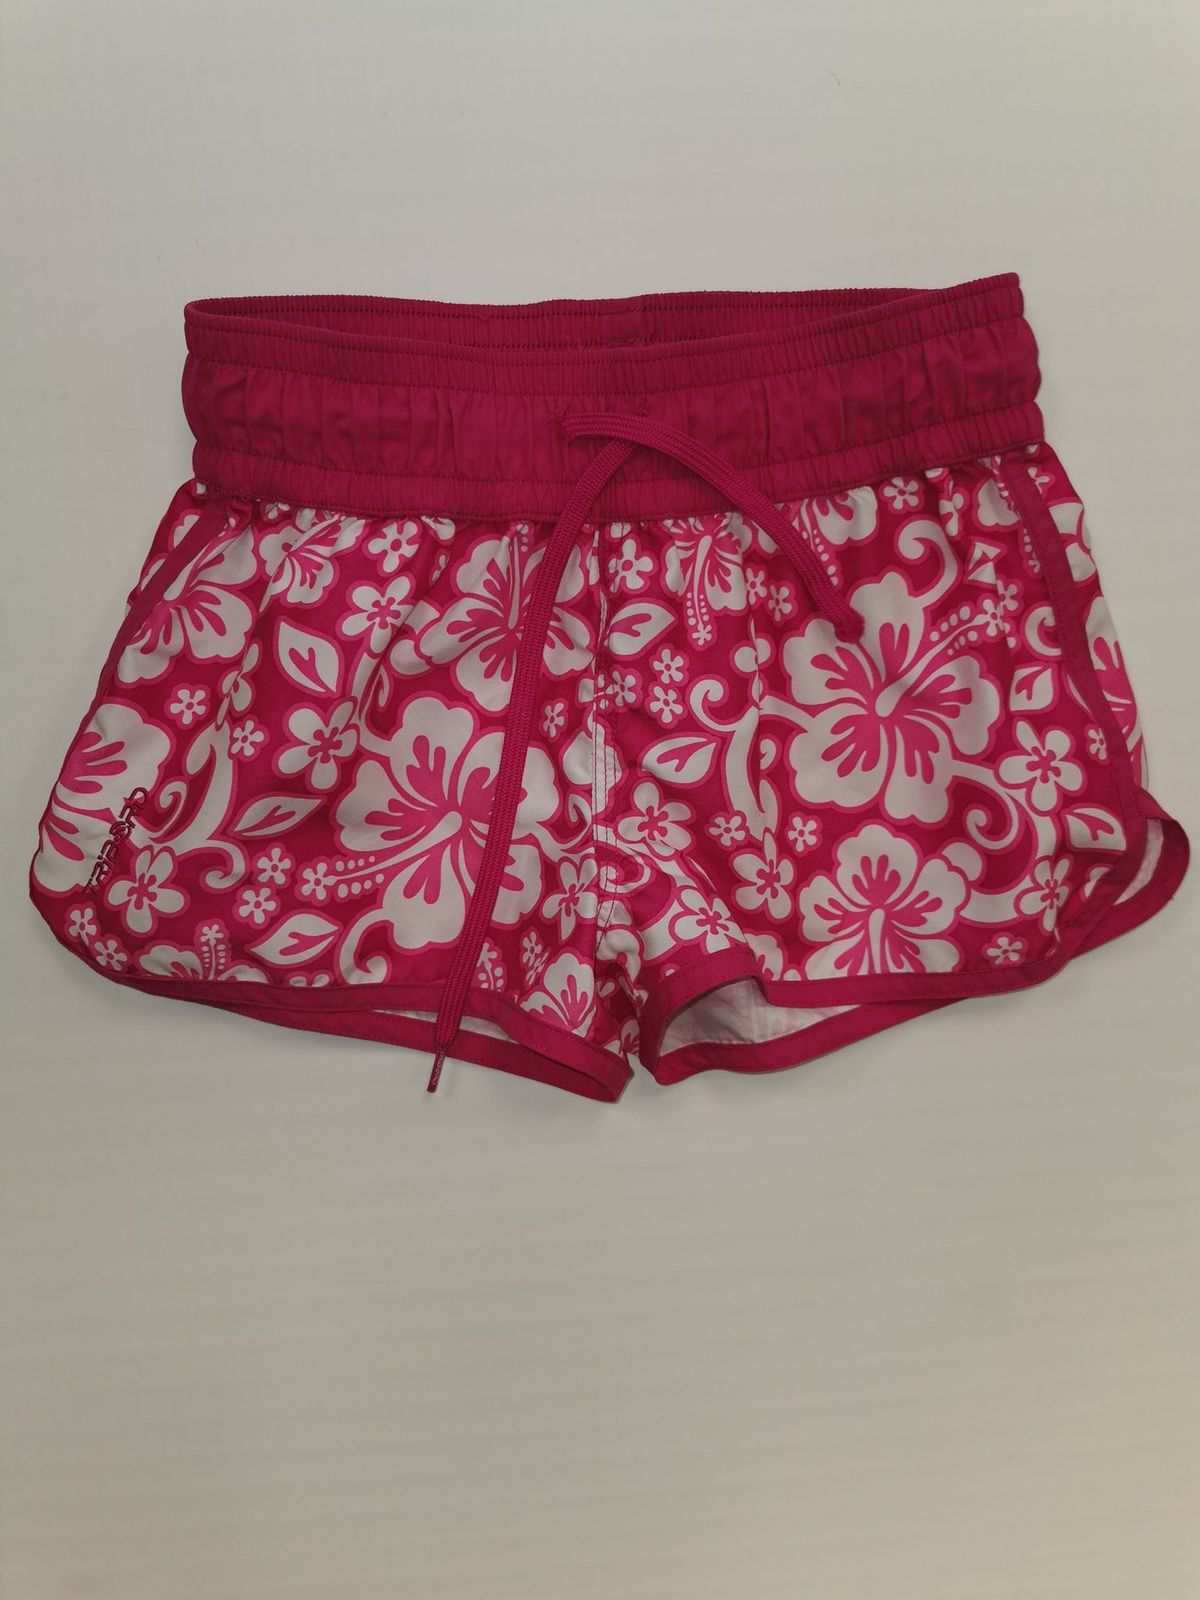 13070. Pantalone 10 anni Euro 6,50